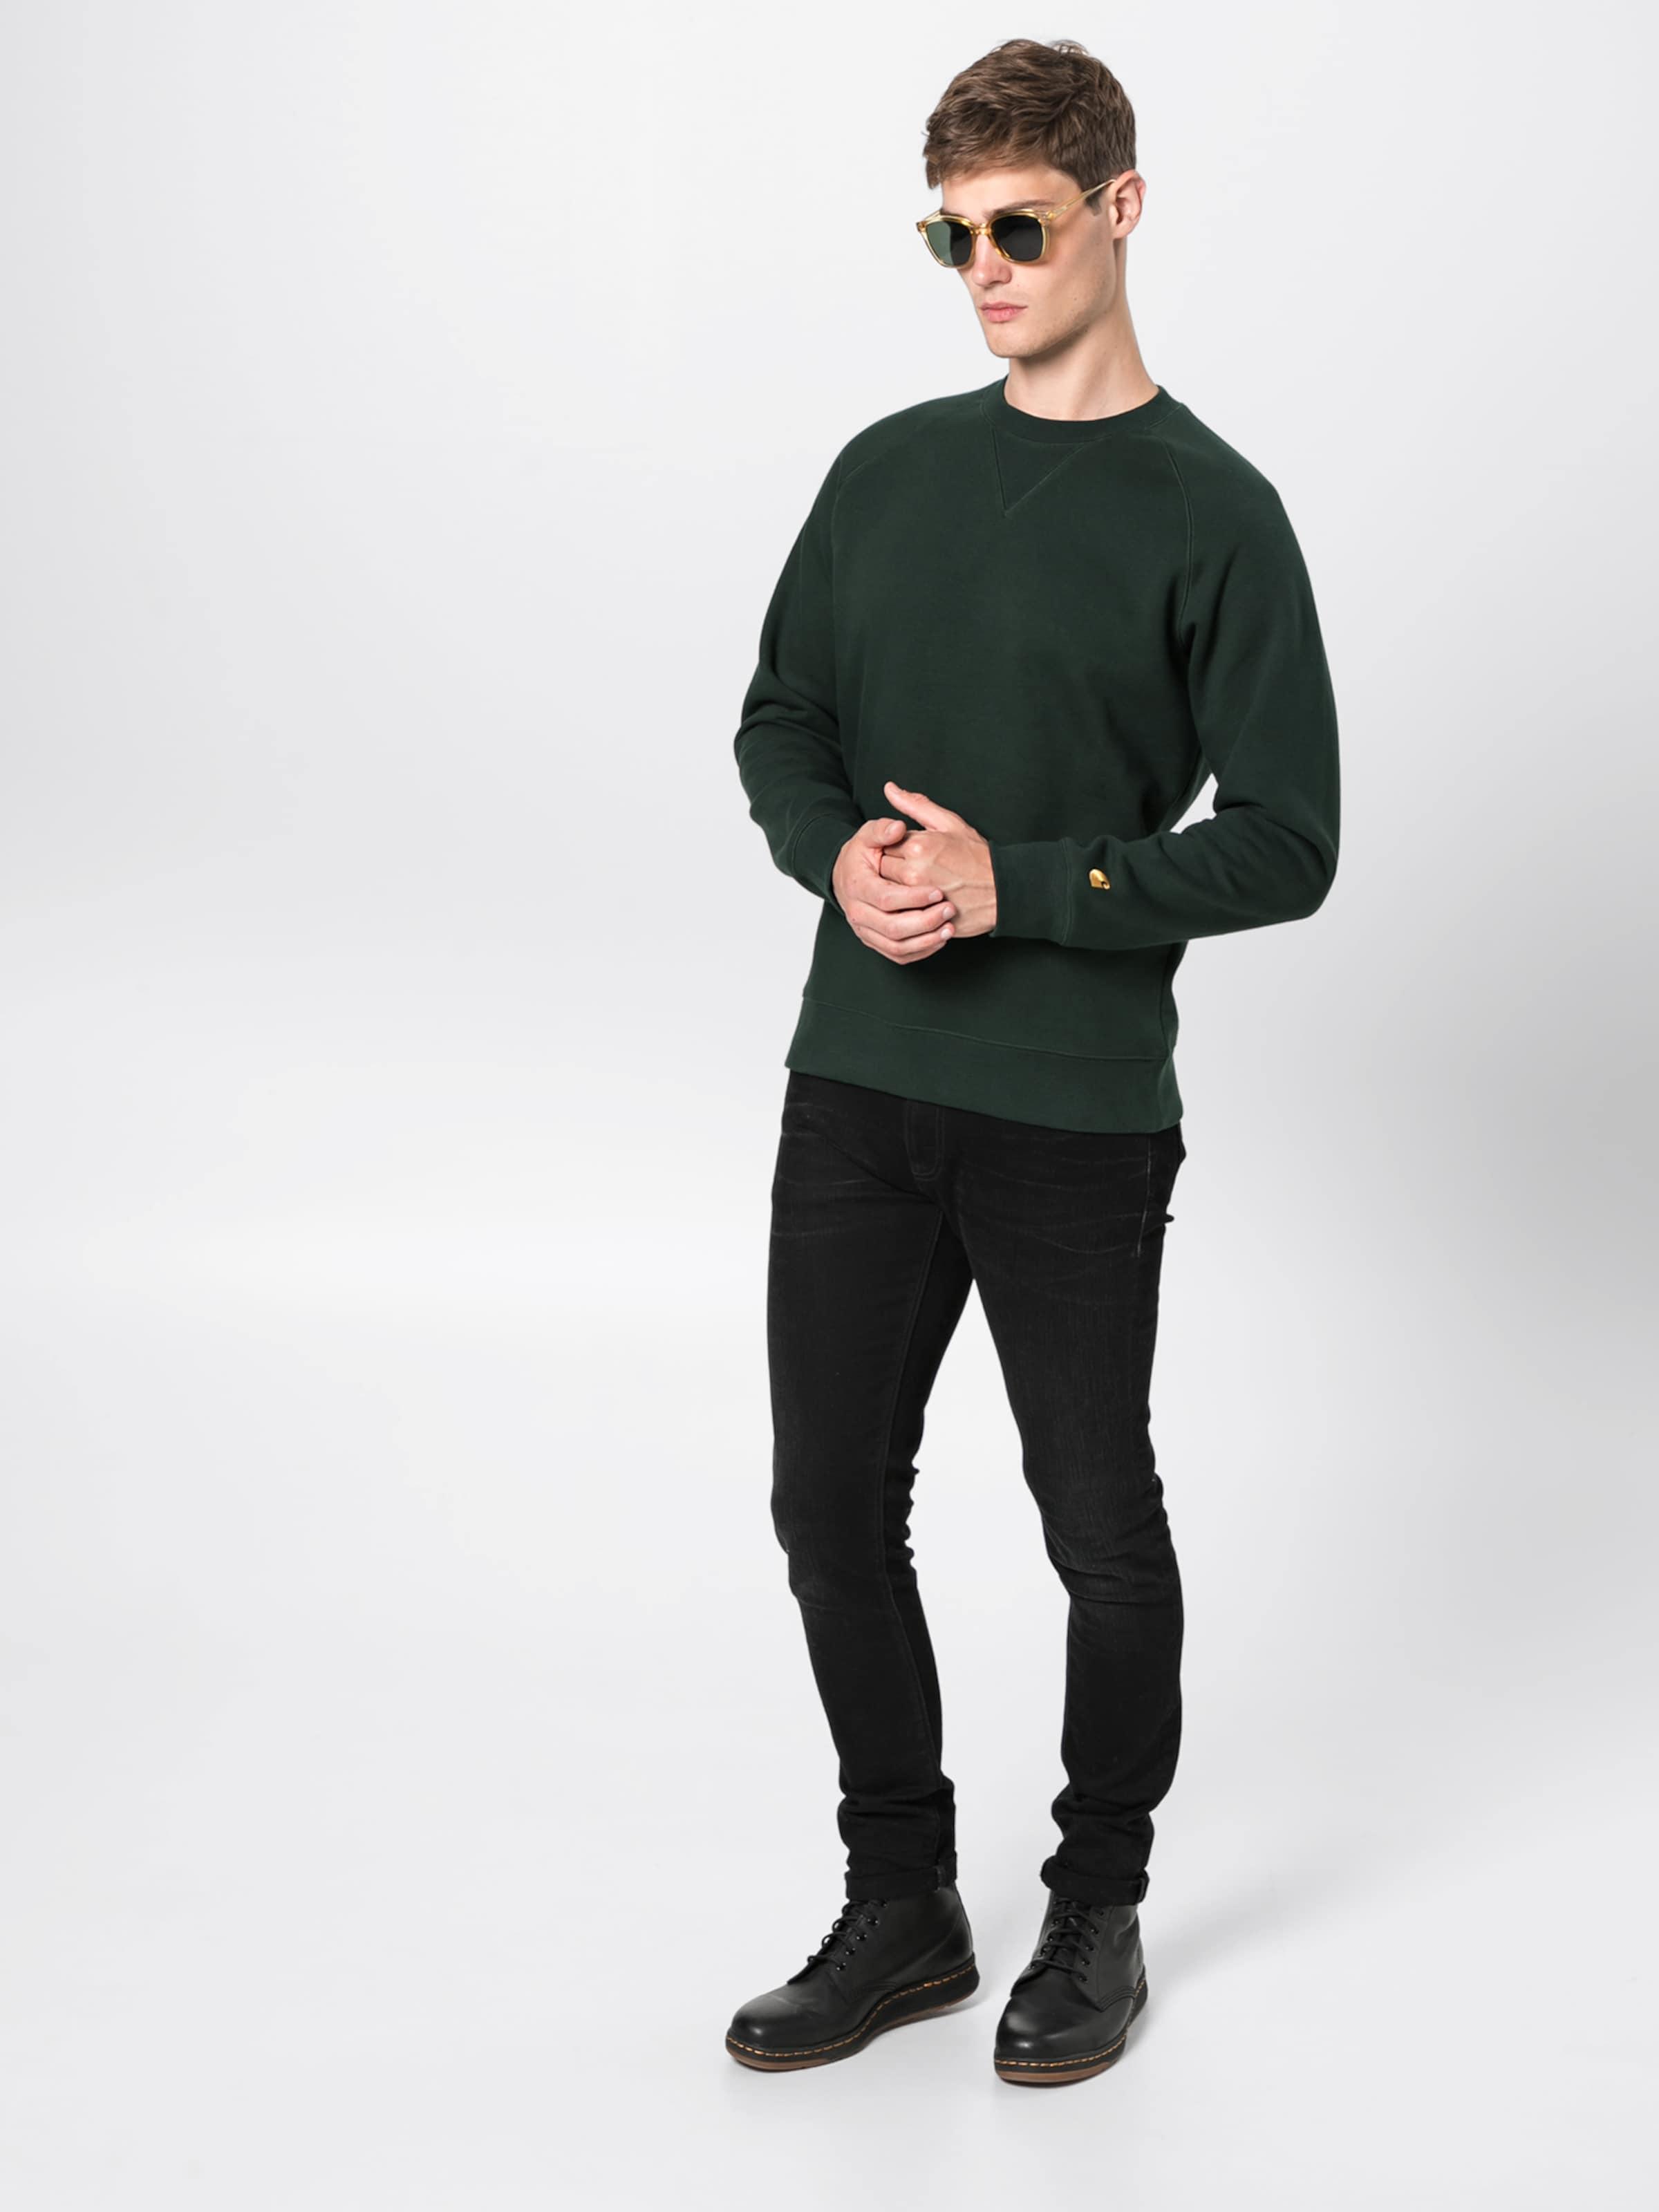 'chase' Wip Carhartt Sweatshirt In Tanne Nvm8n0w